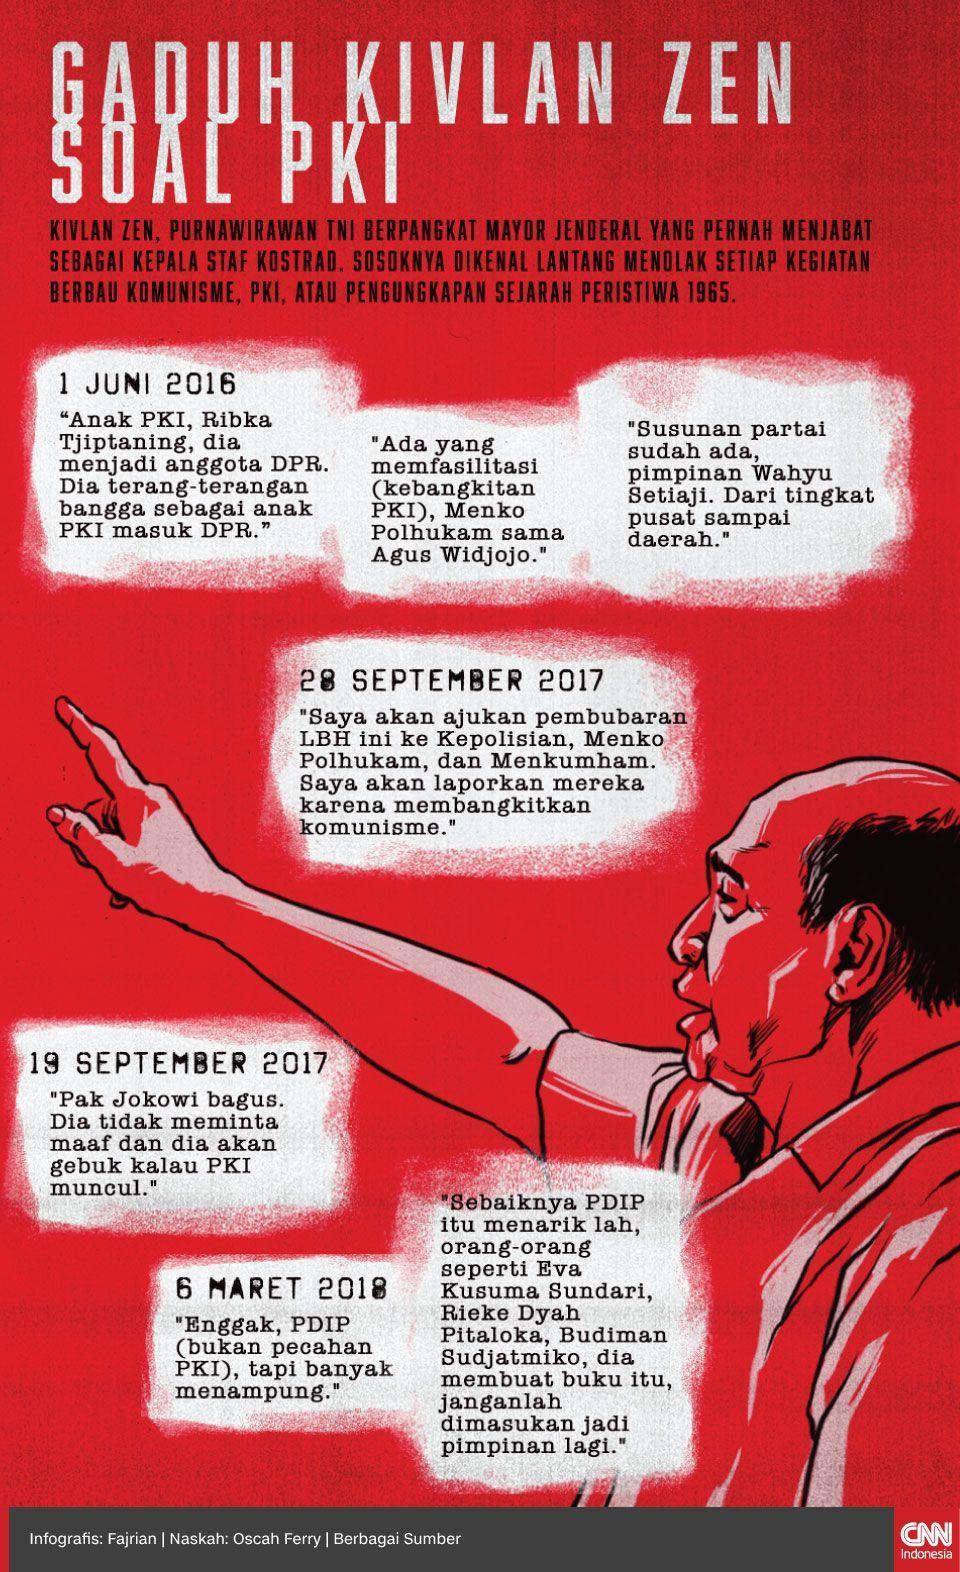 Infografis Gaduh Kivlan Zen Soal PKI